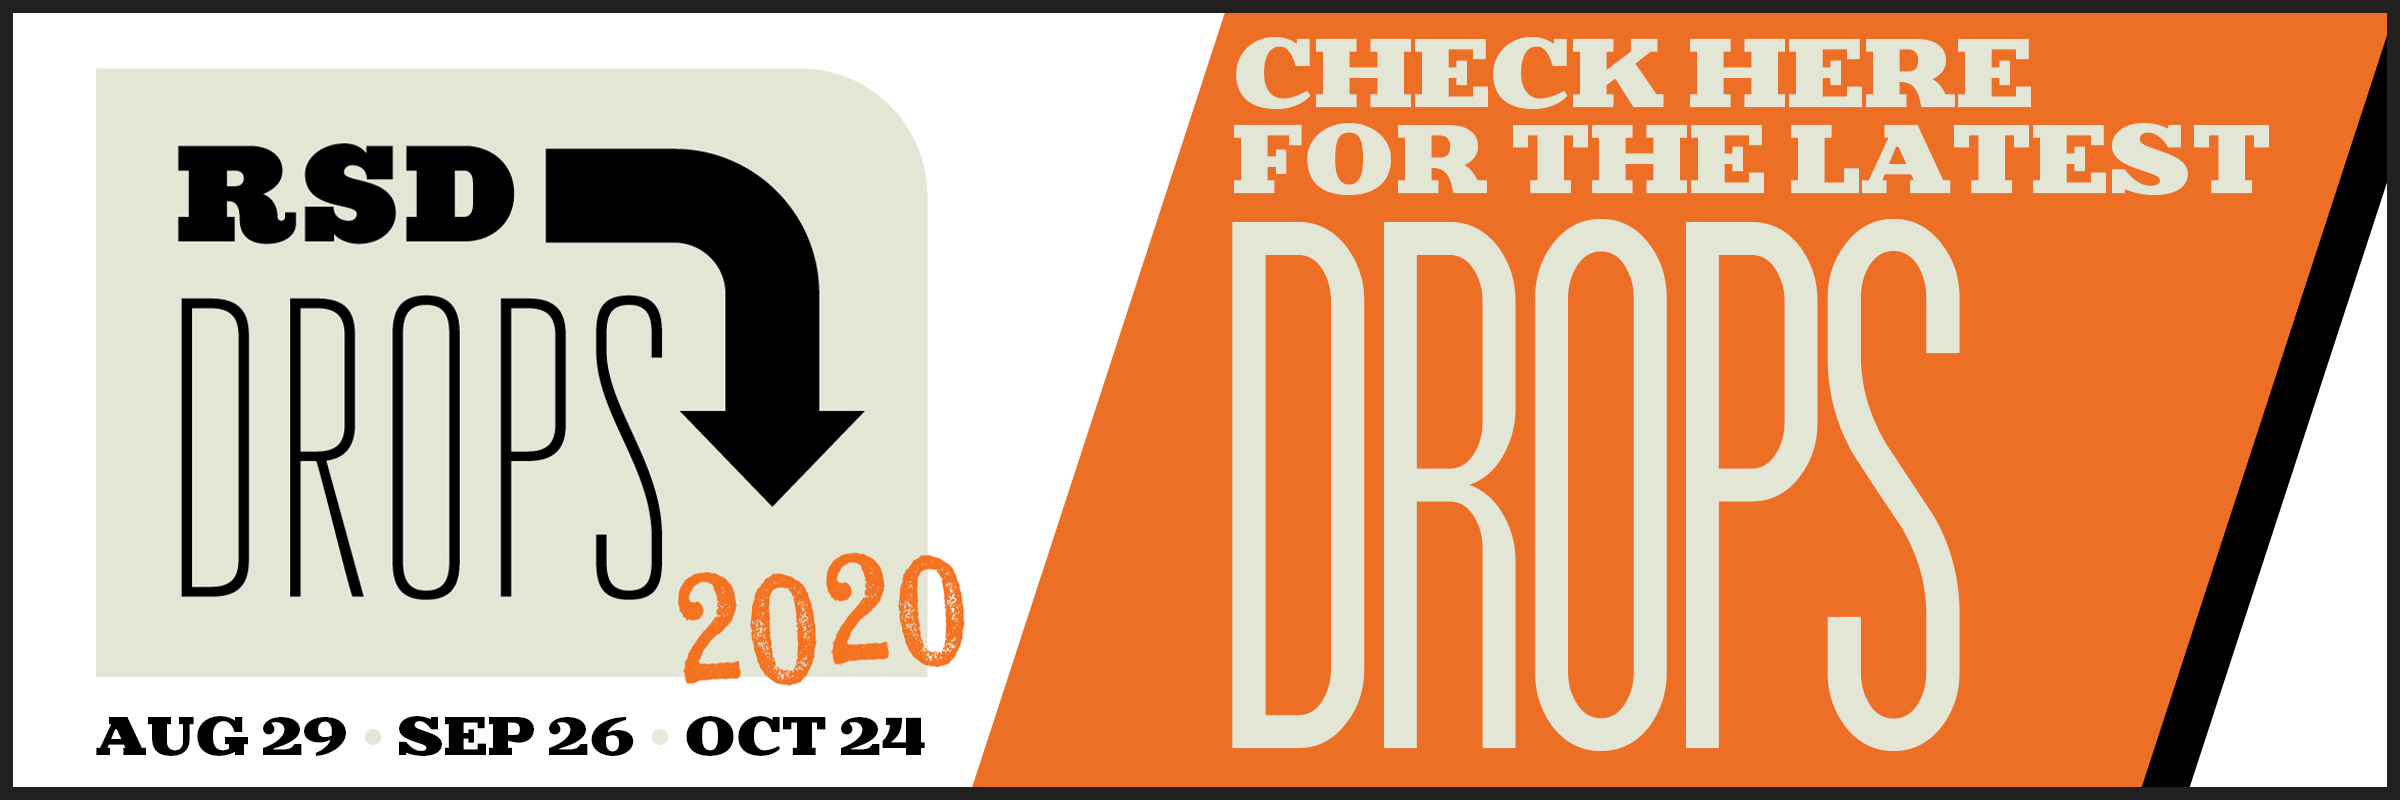 RSD Drops Info